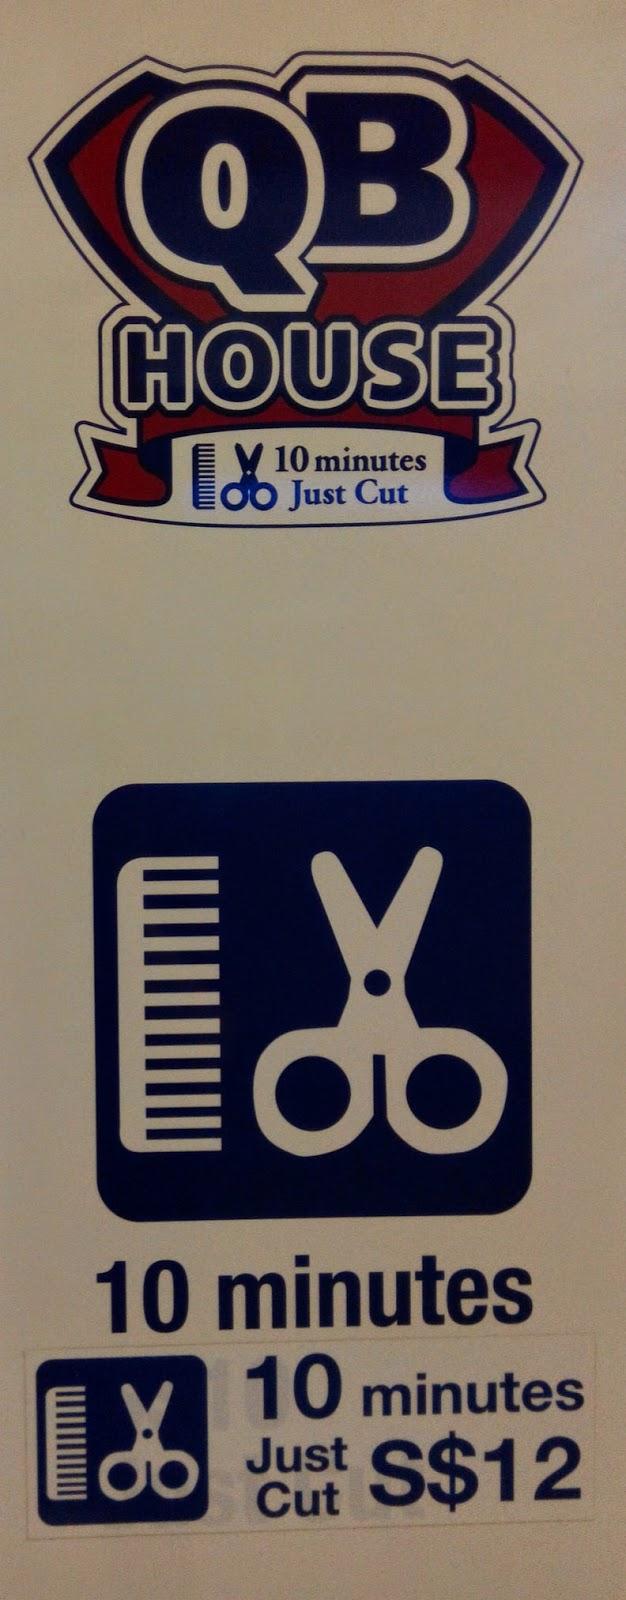 QB House barbershop, Singapore